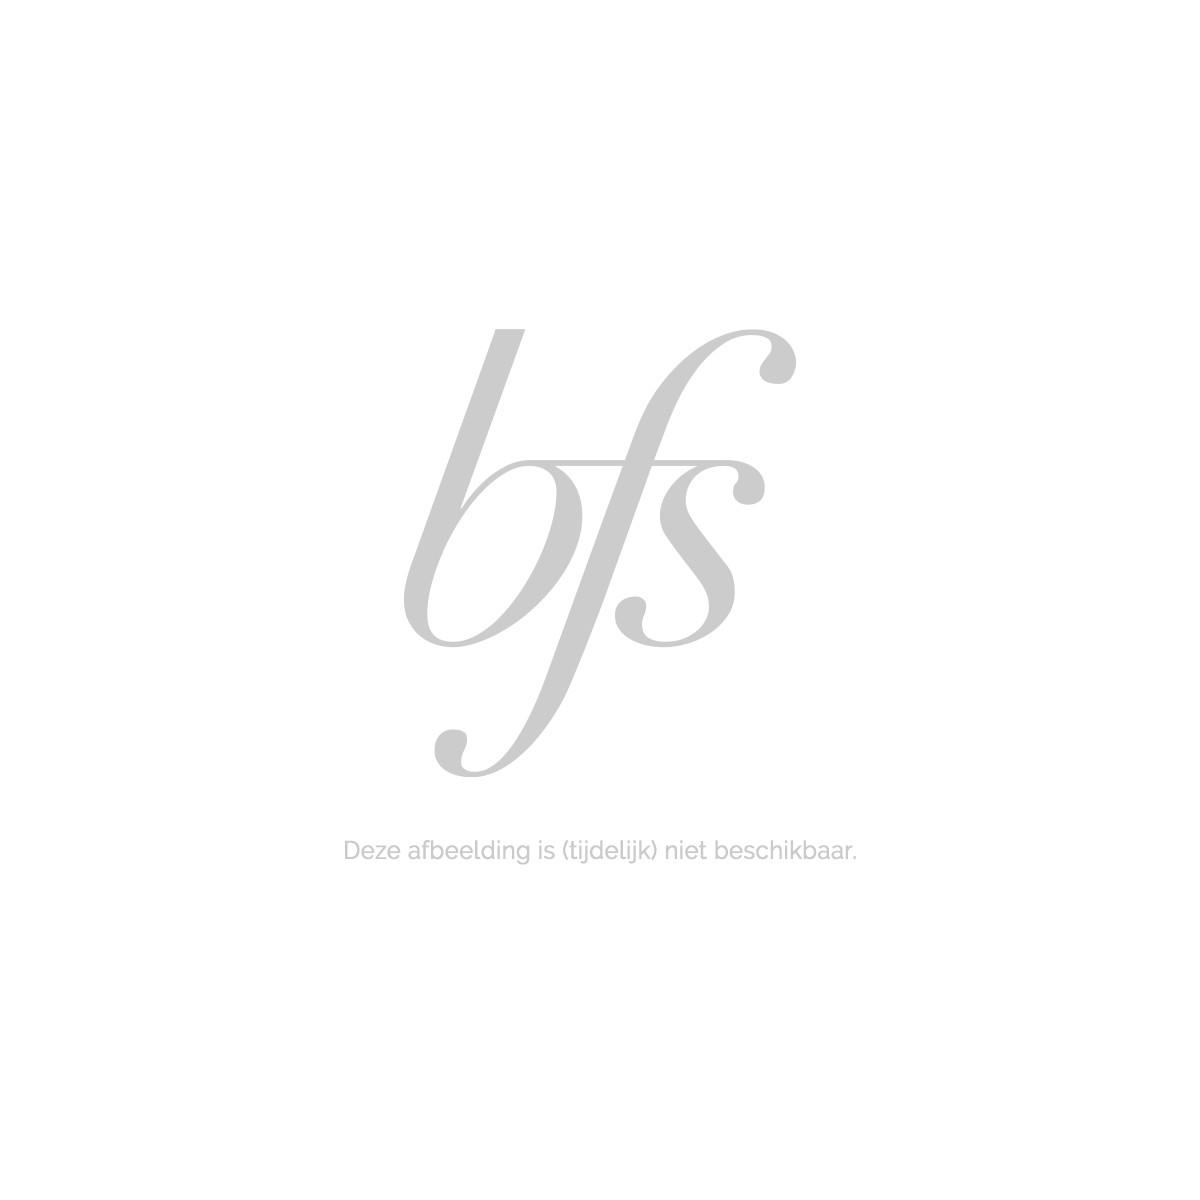 Yves Saint Laurent Mascara Volume Effet Faux Cils Babydoll 5 Ml ... fb4824de2ba